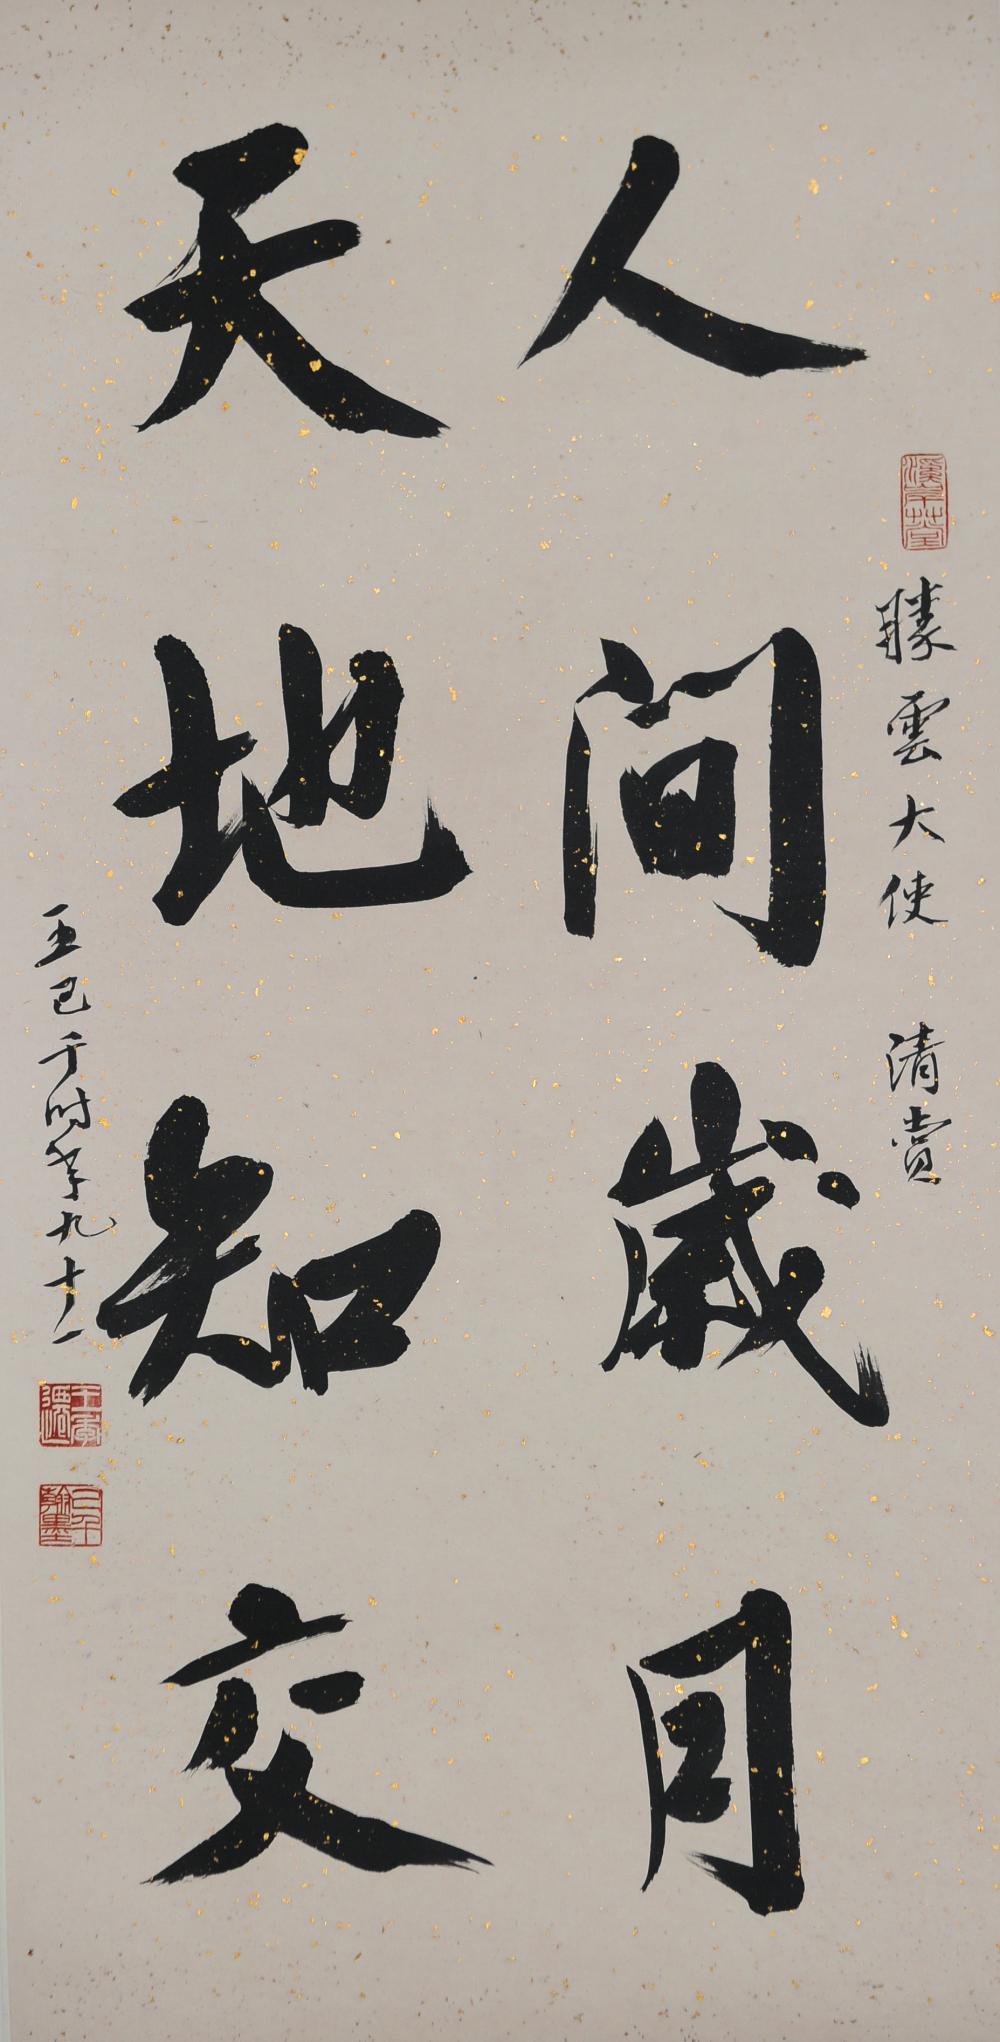 CHINESE 8-CHARACTER CALLIGRAPHY BY WANG JIQIAN